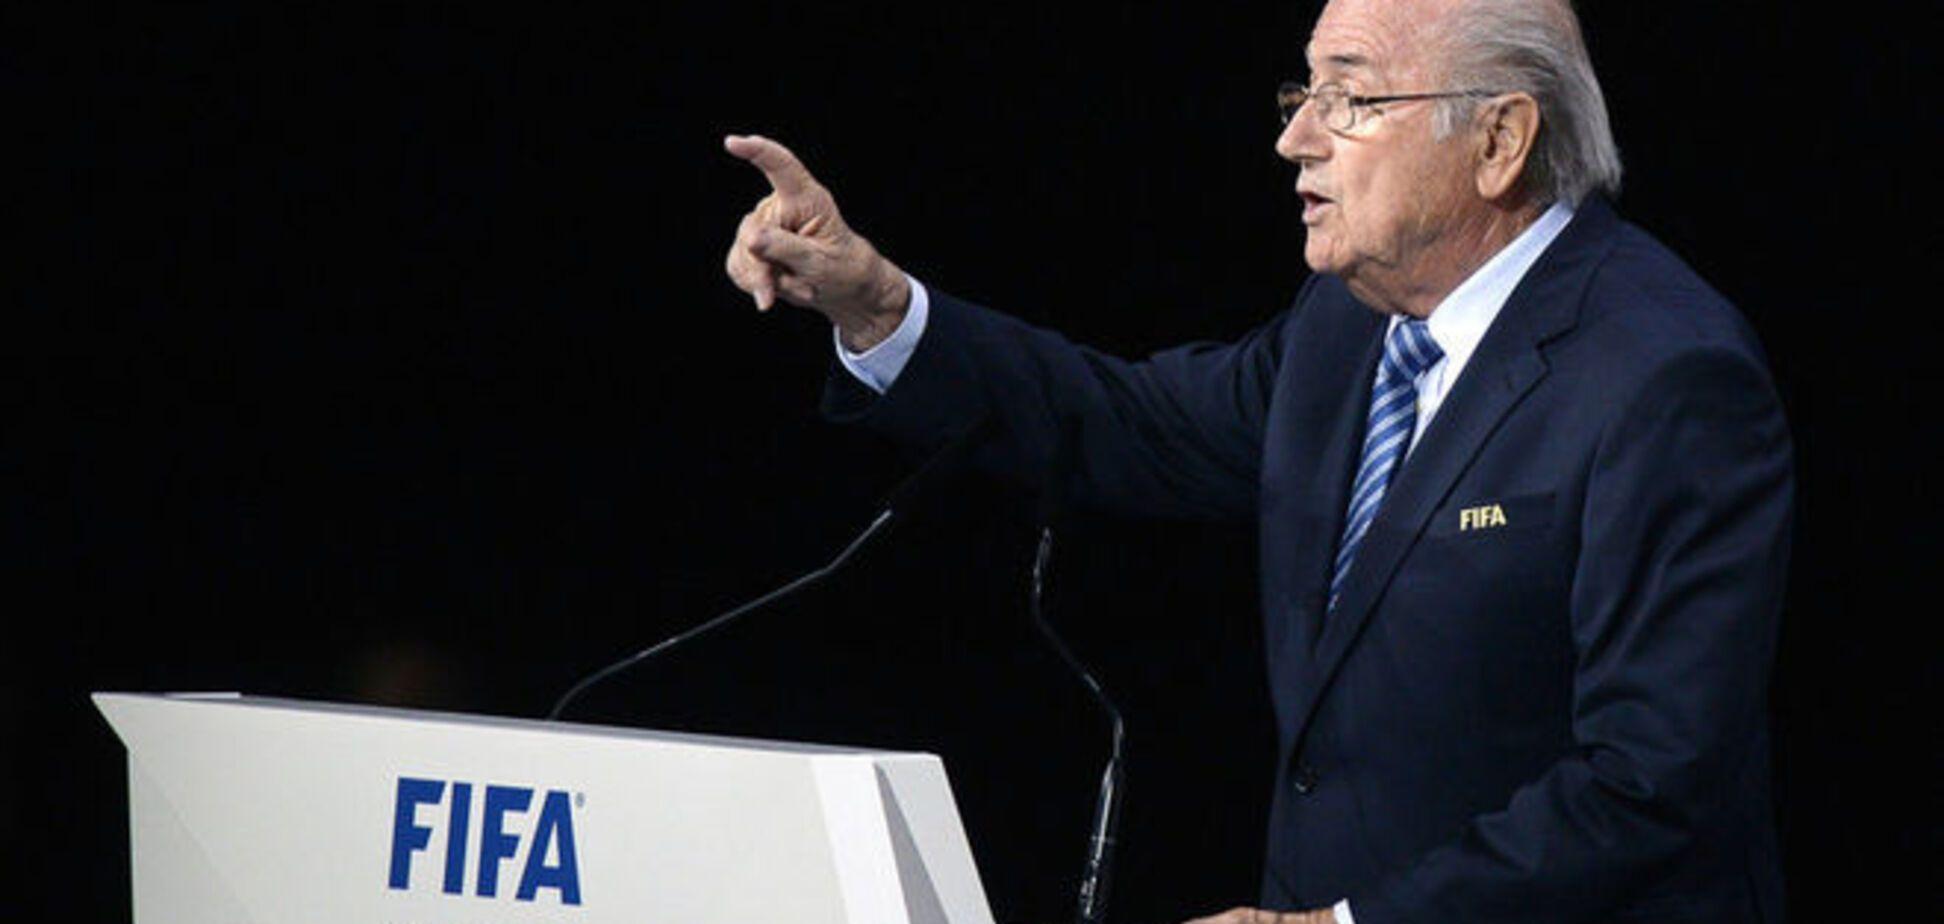 Йозеф Блаттер переизбран президентом ФИФА